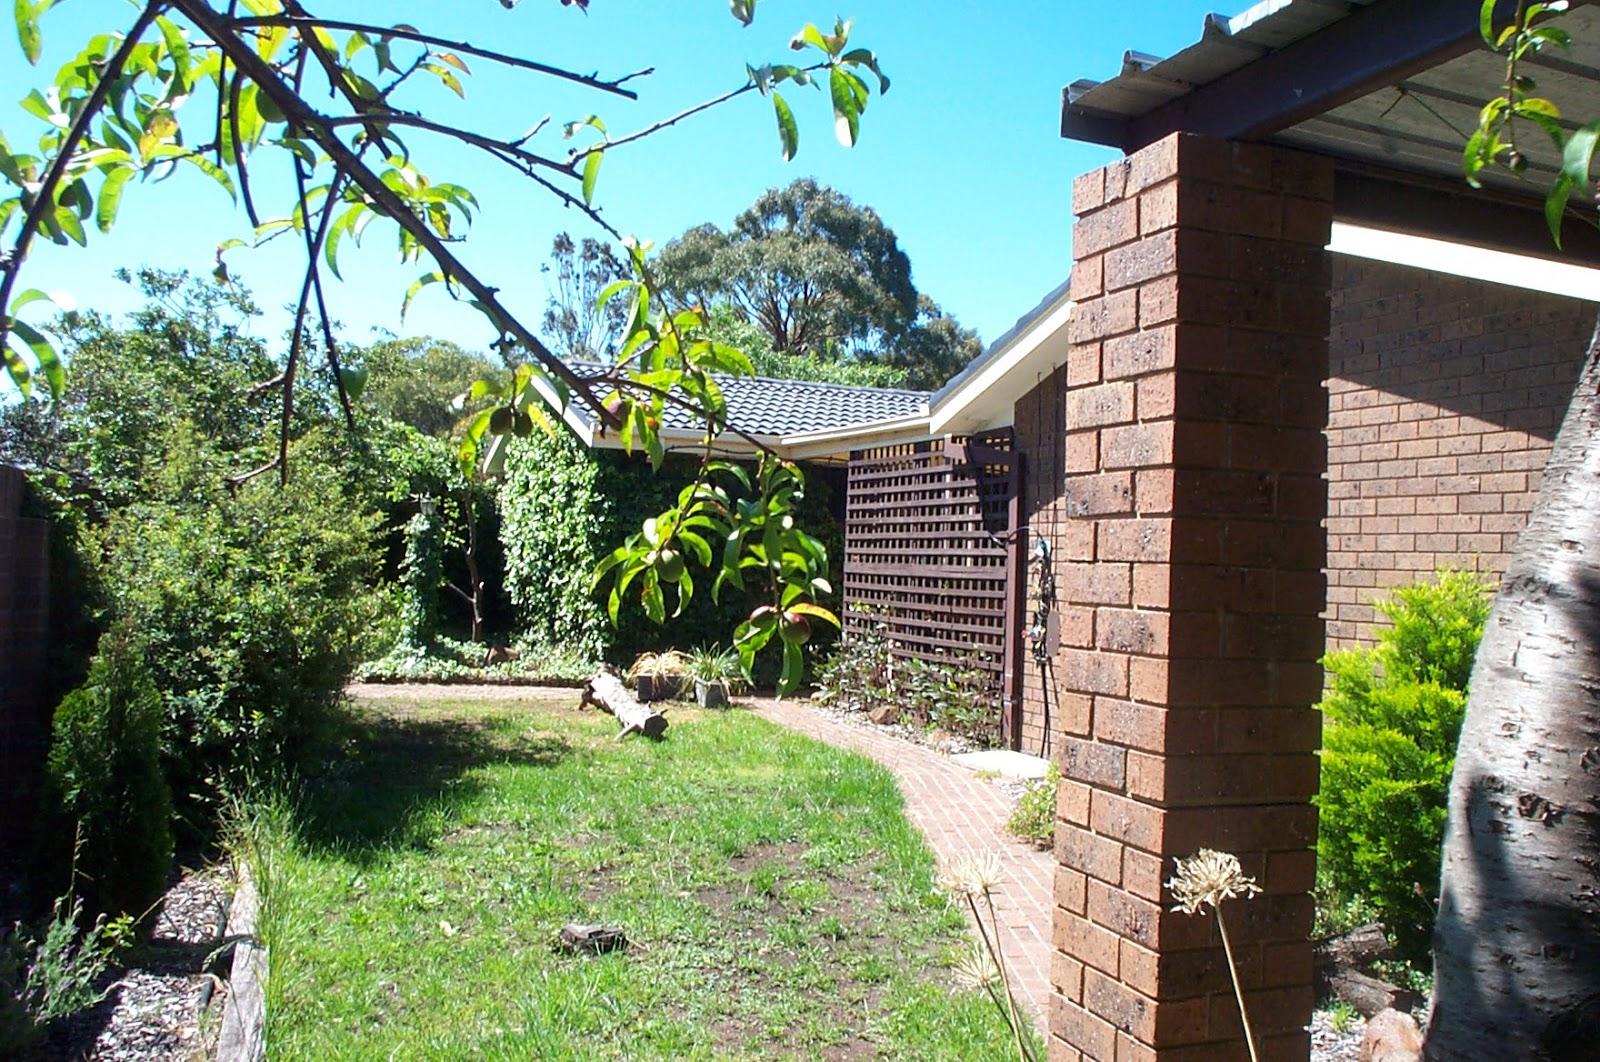 Garden Design Vegetable Patch : How to make raised garden beds for vegetables the greening of gavin